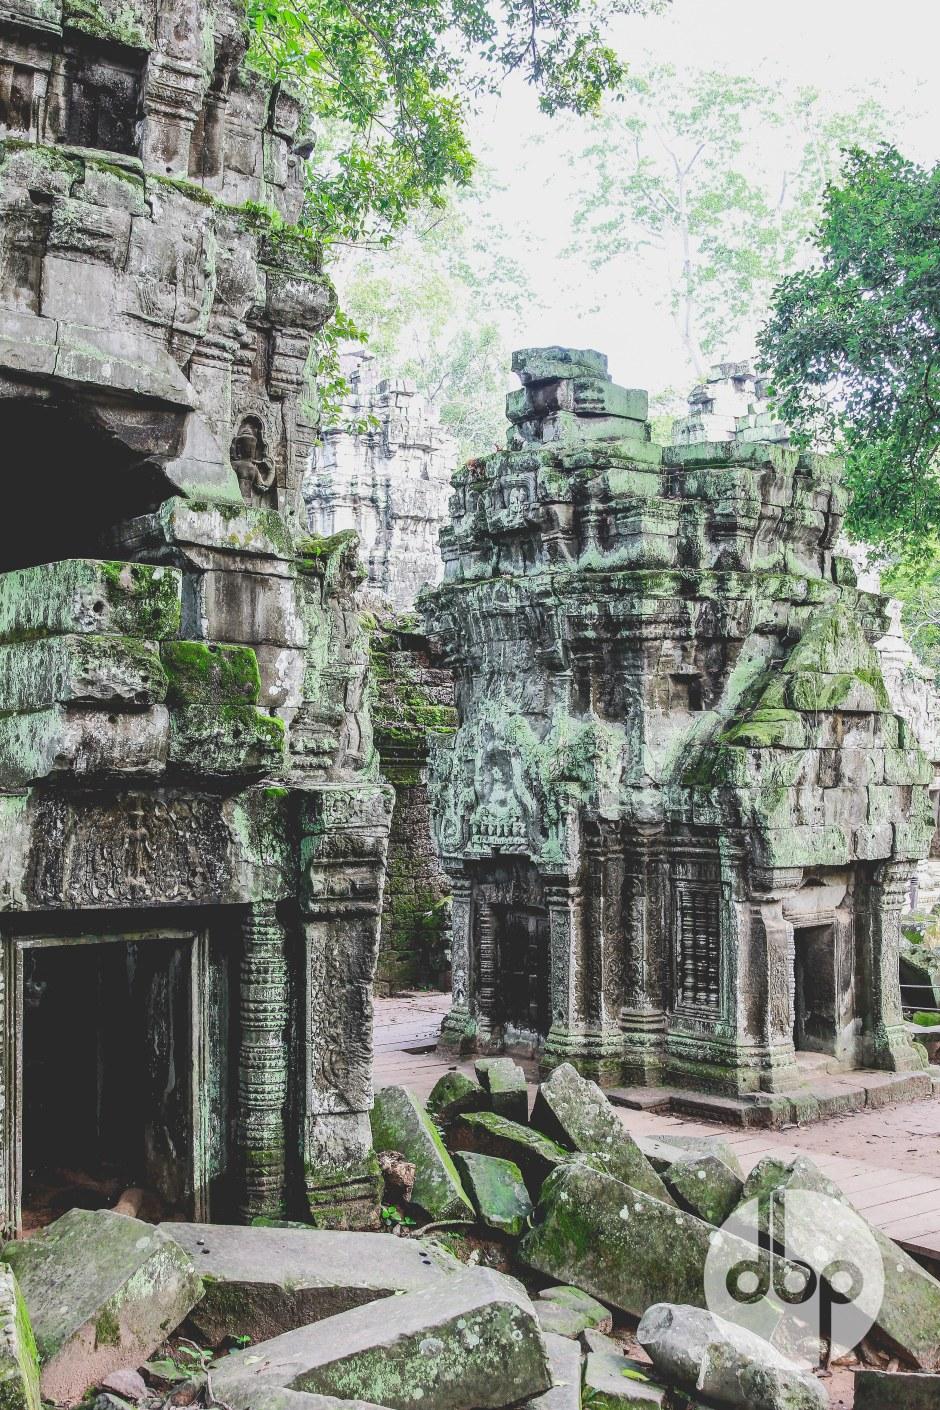 cambodia-2015-medres-12